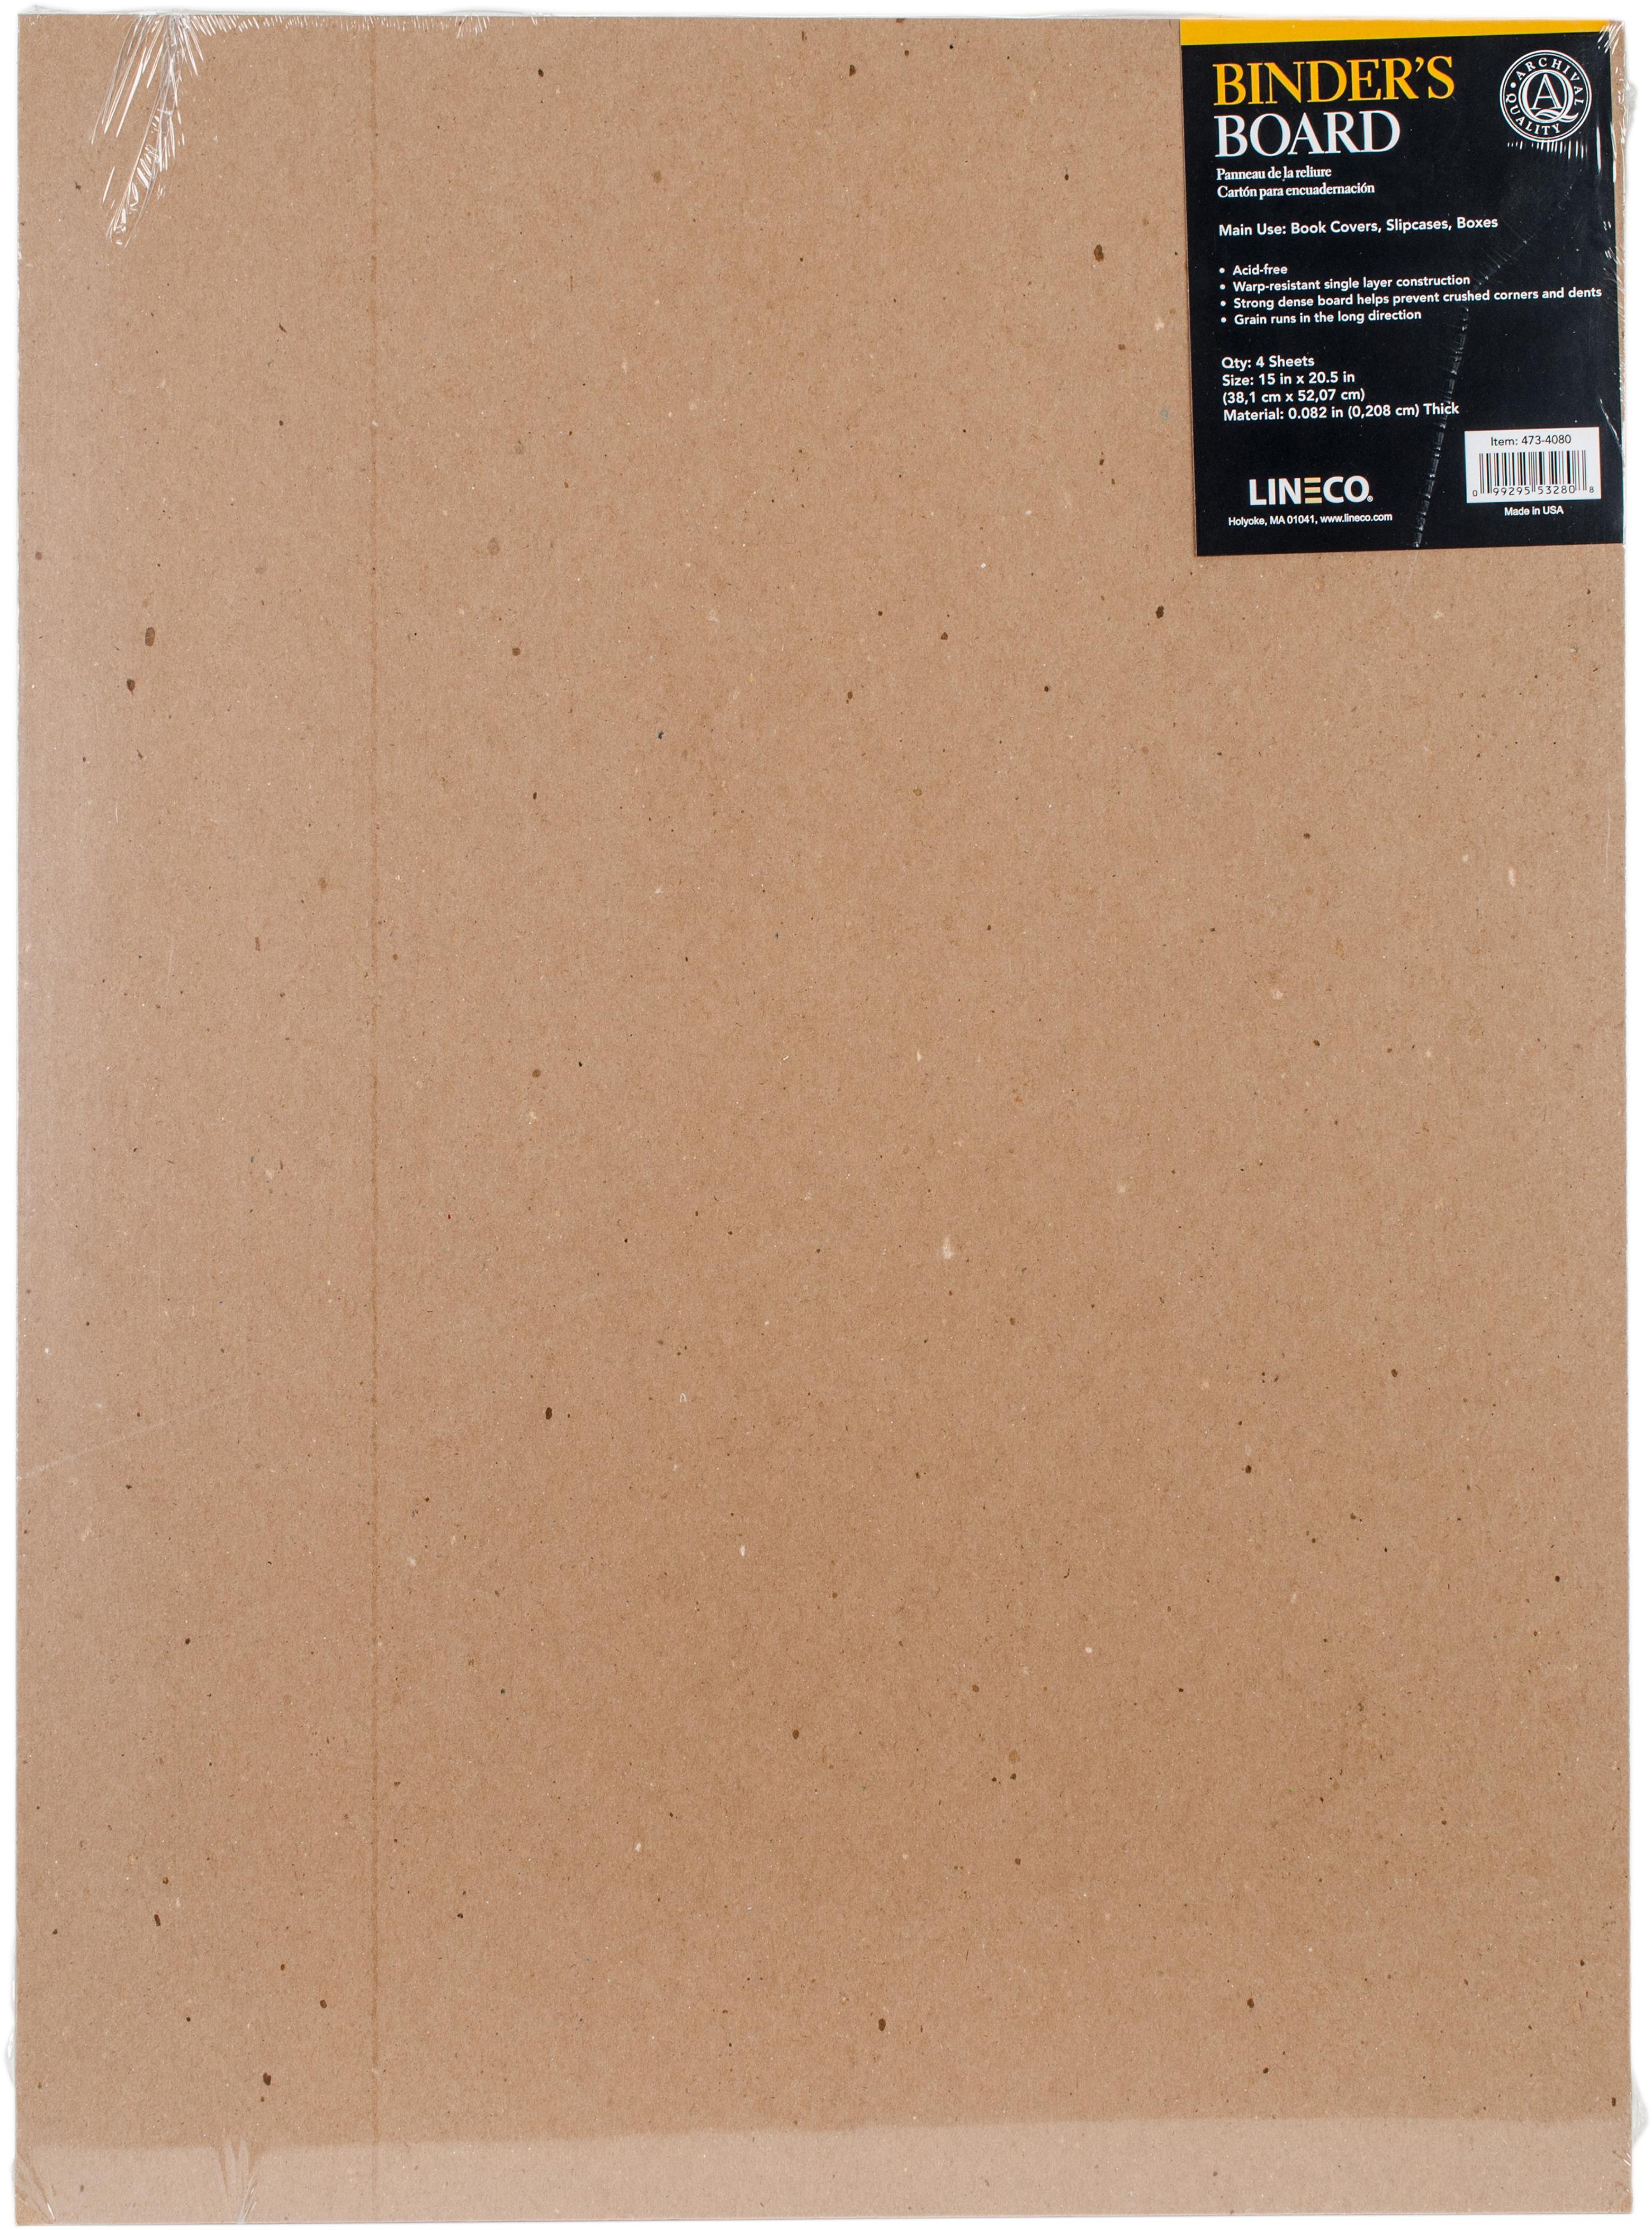 Lineco Binder's Board 4/Pkg-15X20.5X.082 (80 Point)